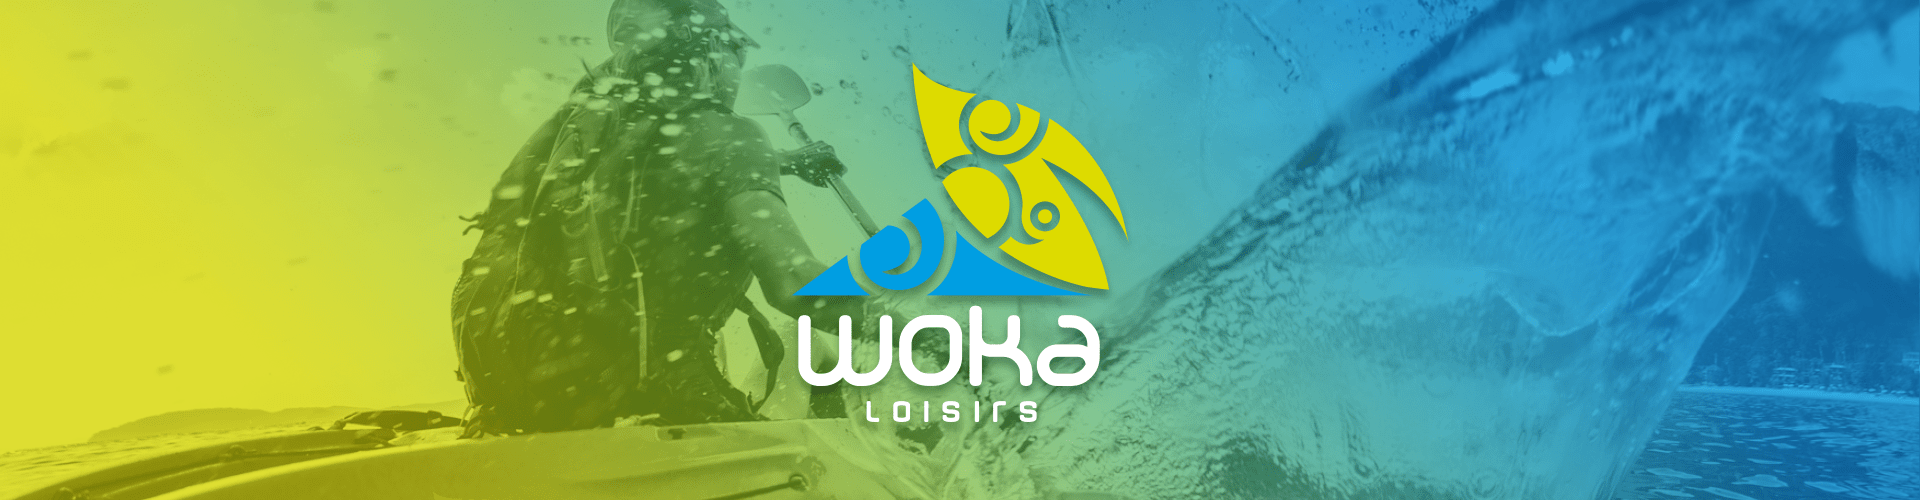 Woka loisirs - Partenaires